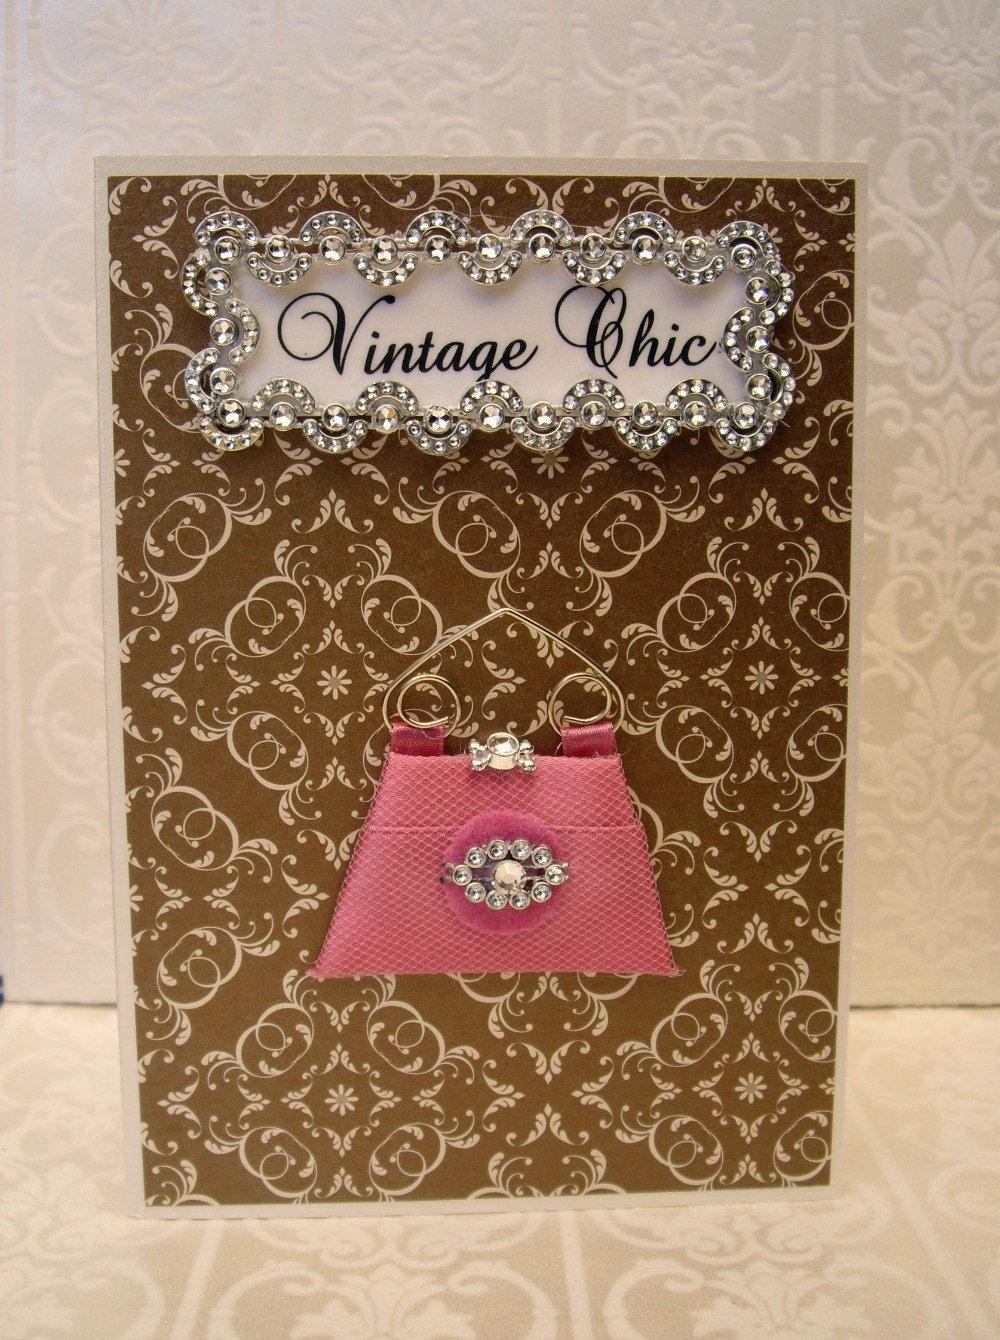 15% SALE Vintage Chic Personalised Card / Pink Clutch Bag / Handmade Greeting Card